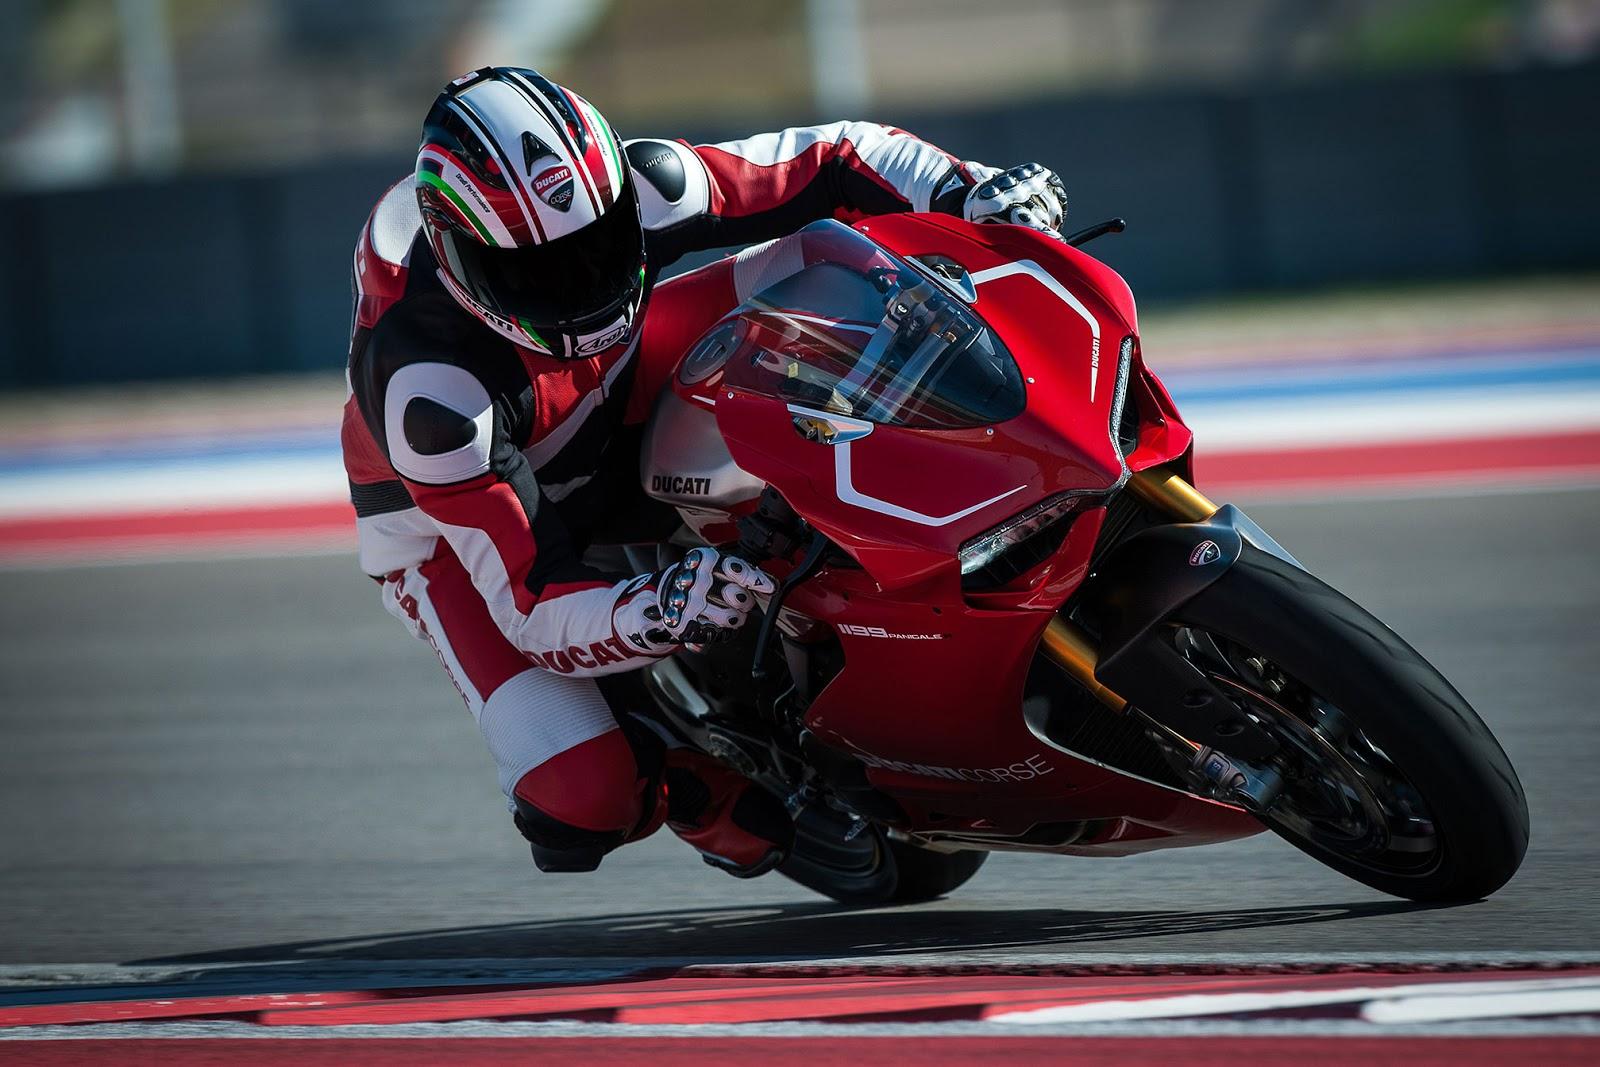 Ducati Workshop Manuals Resource  2015 Ducati Superbike